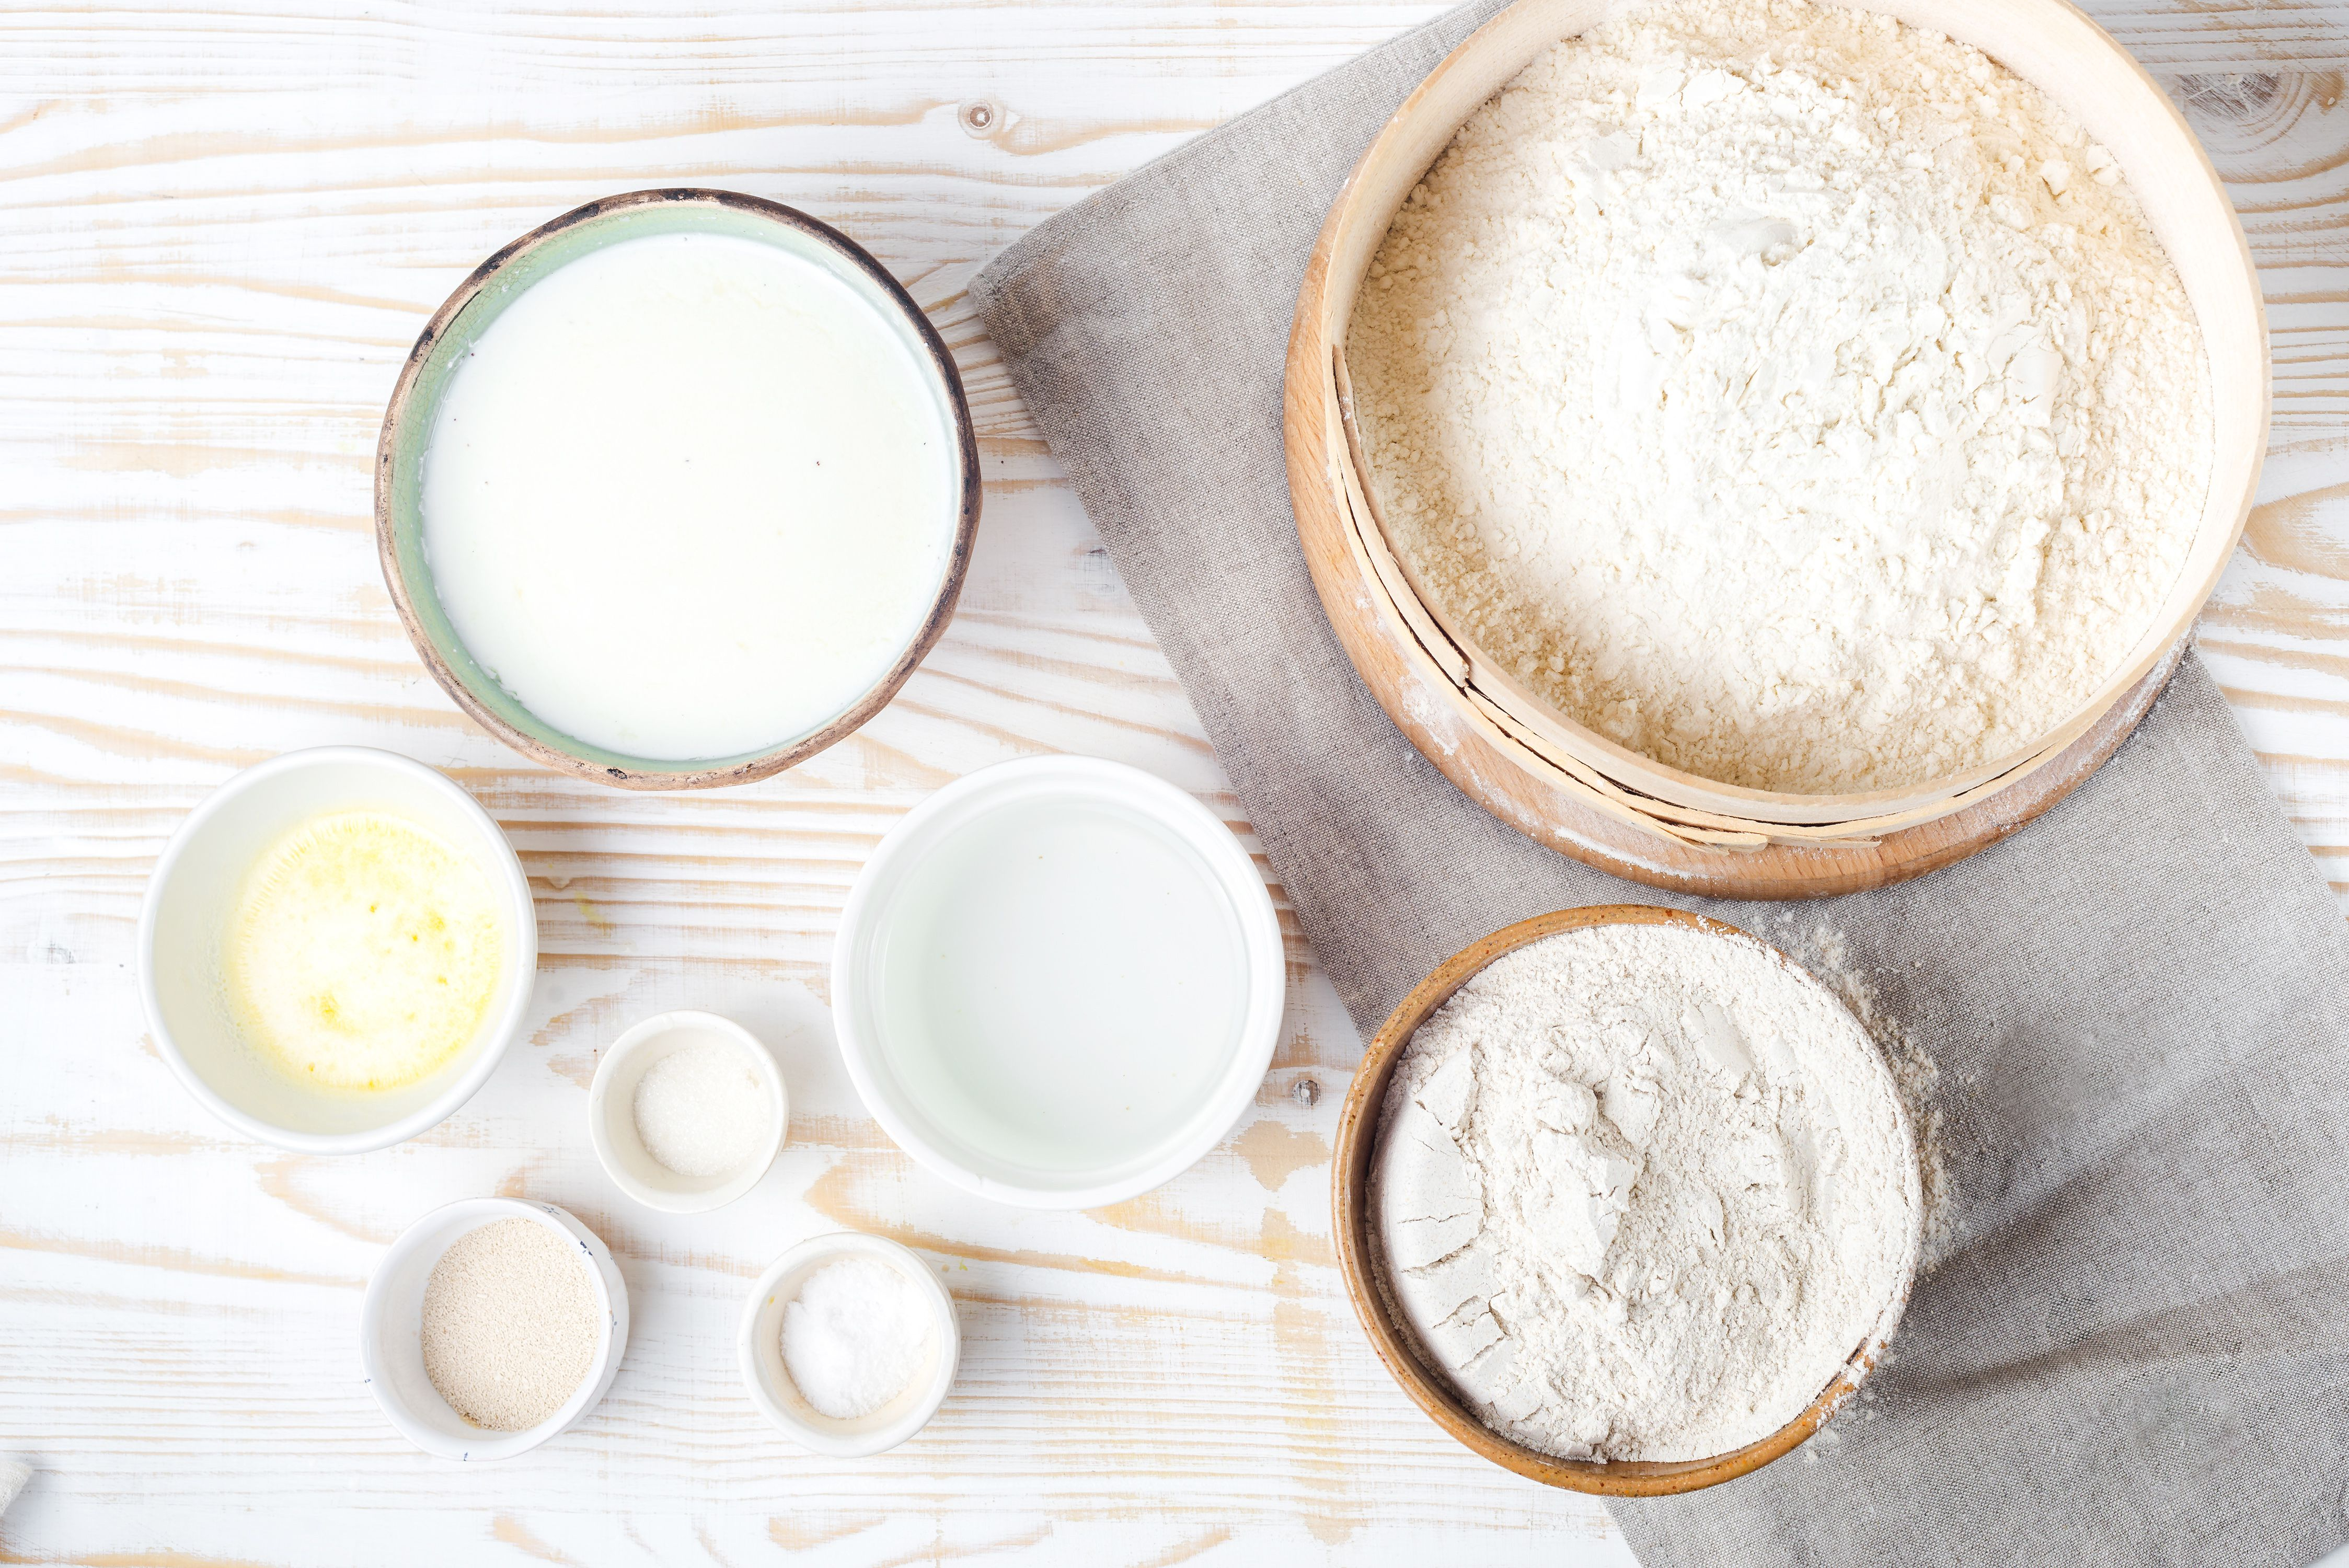 Ingredients for Polish buttermilk rye bread